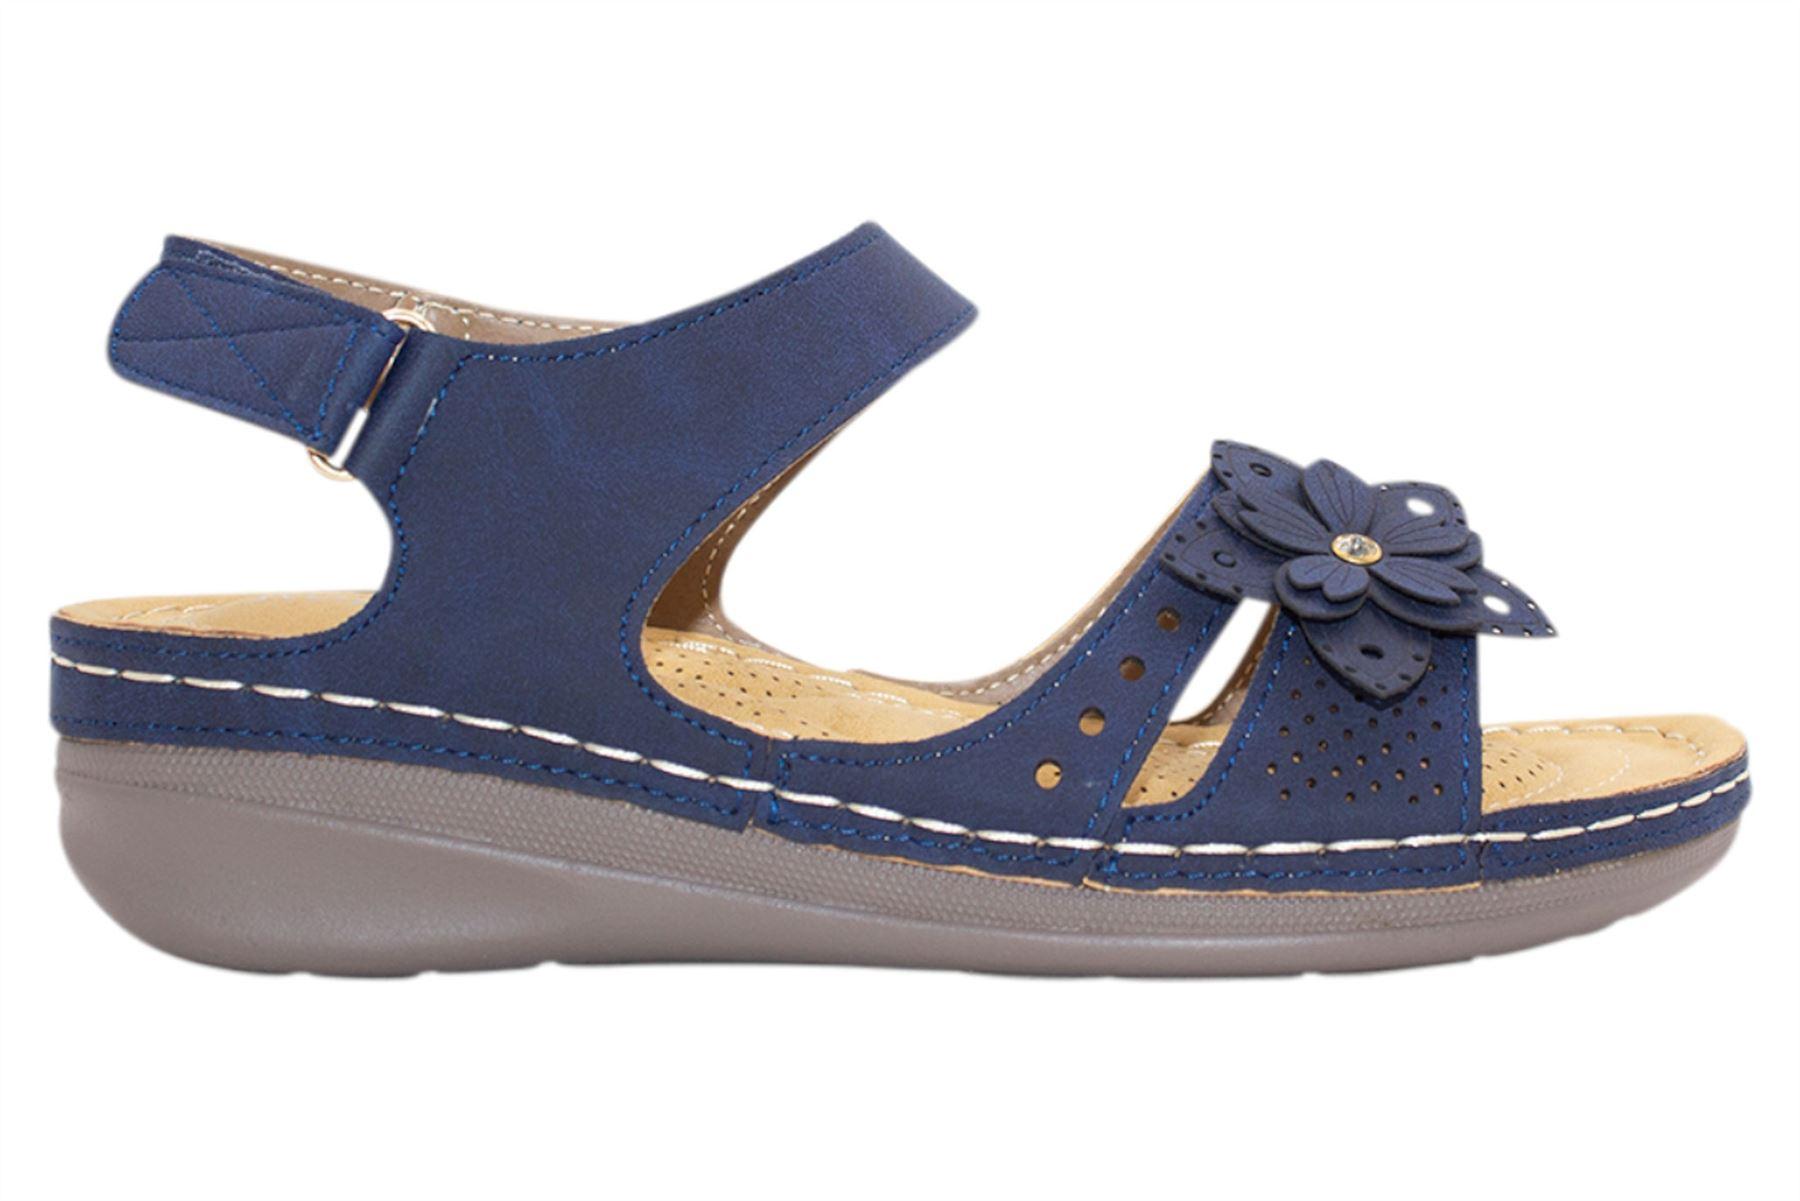 Ladies-Wedge-Heel-Sandal-Womens-Comfort-Cushion-Strapy-Summer-Shoes miniatura 31